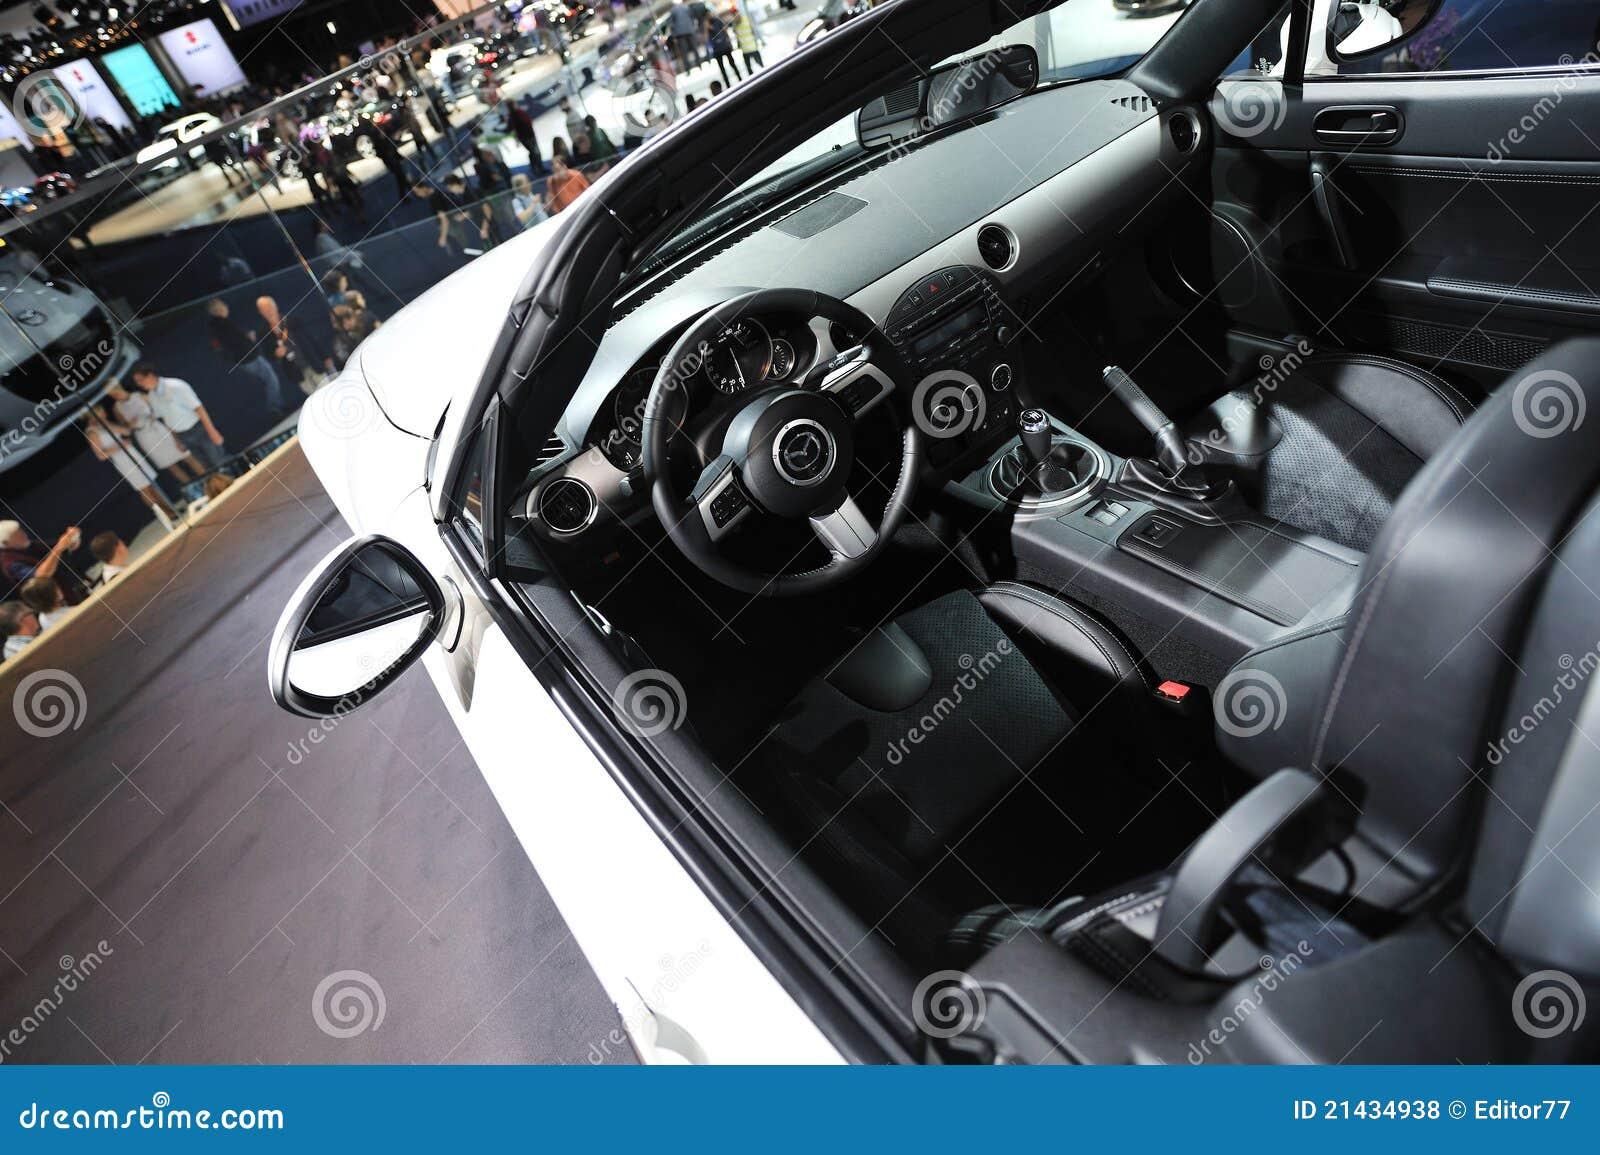 mazda mx 5 car interior editorial stock photo image 21434938. Black Bedroom Furniture Sets. Home Design Ideas